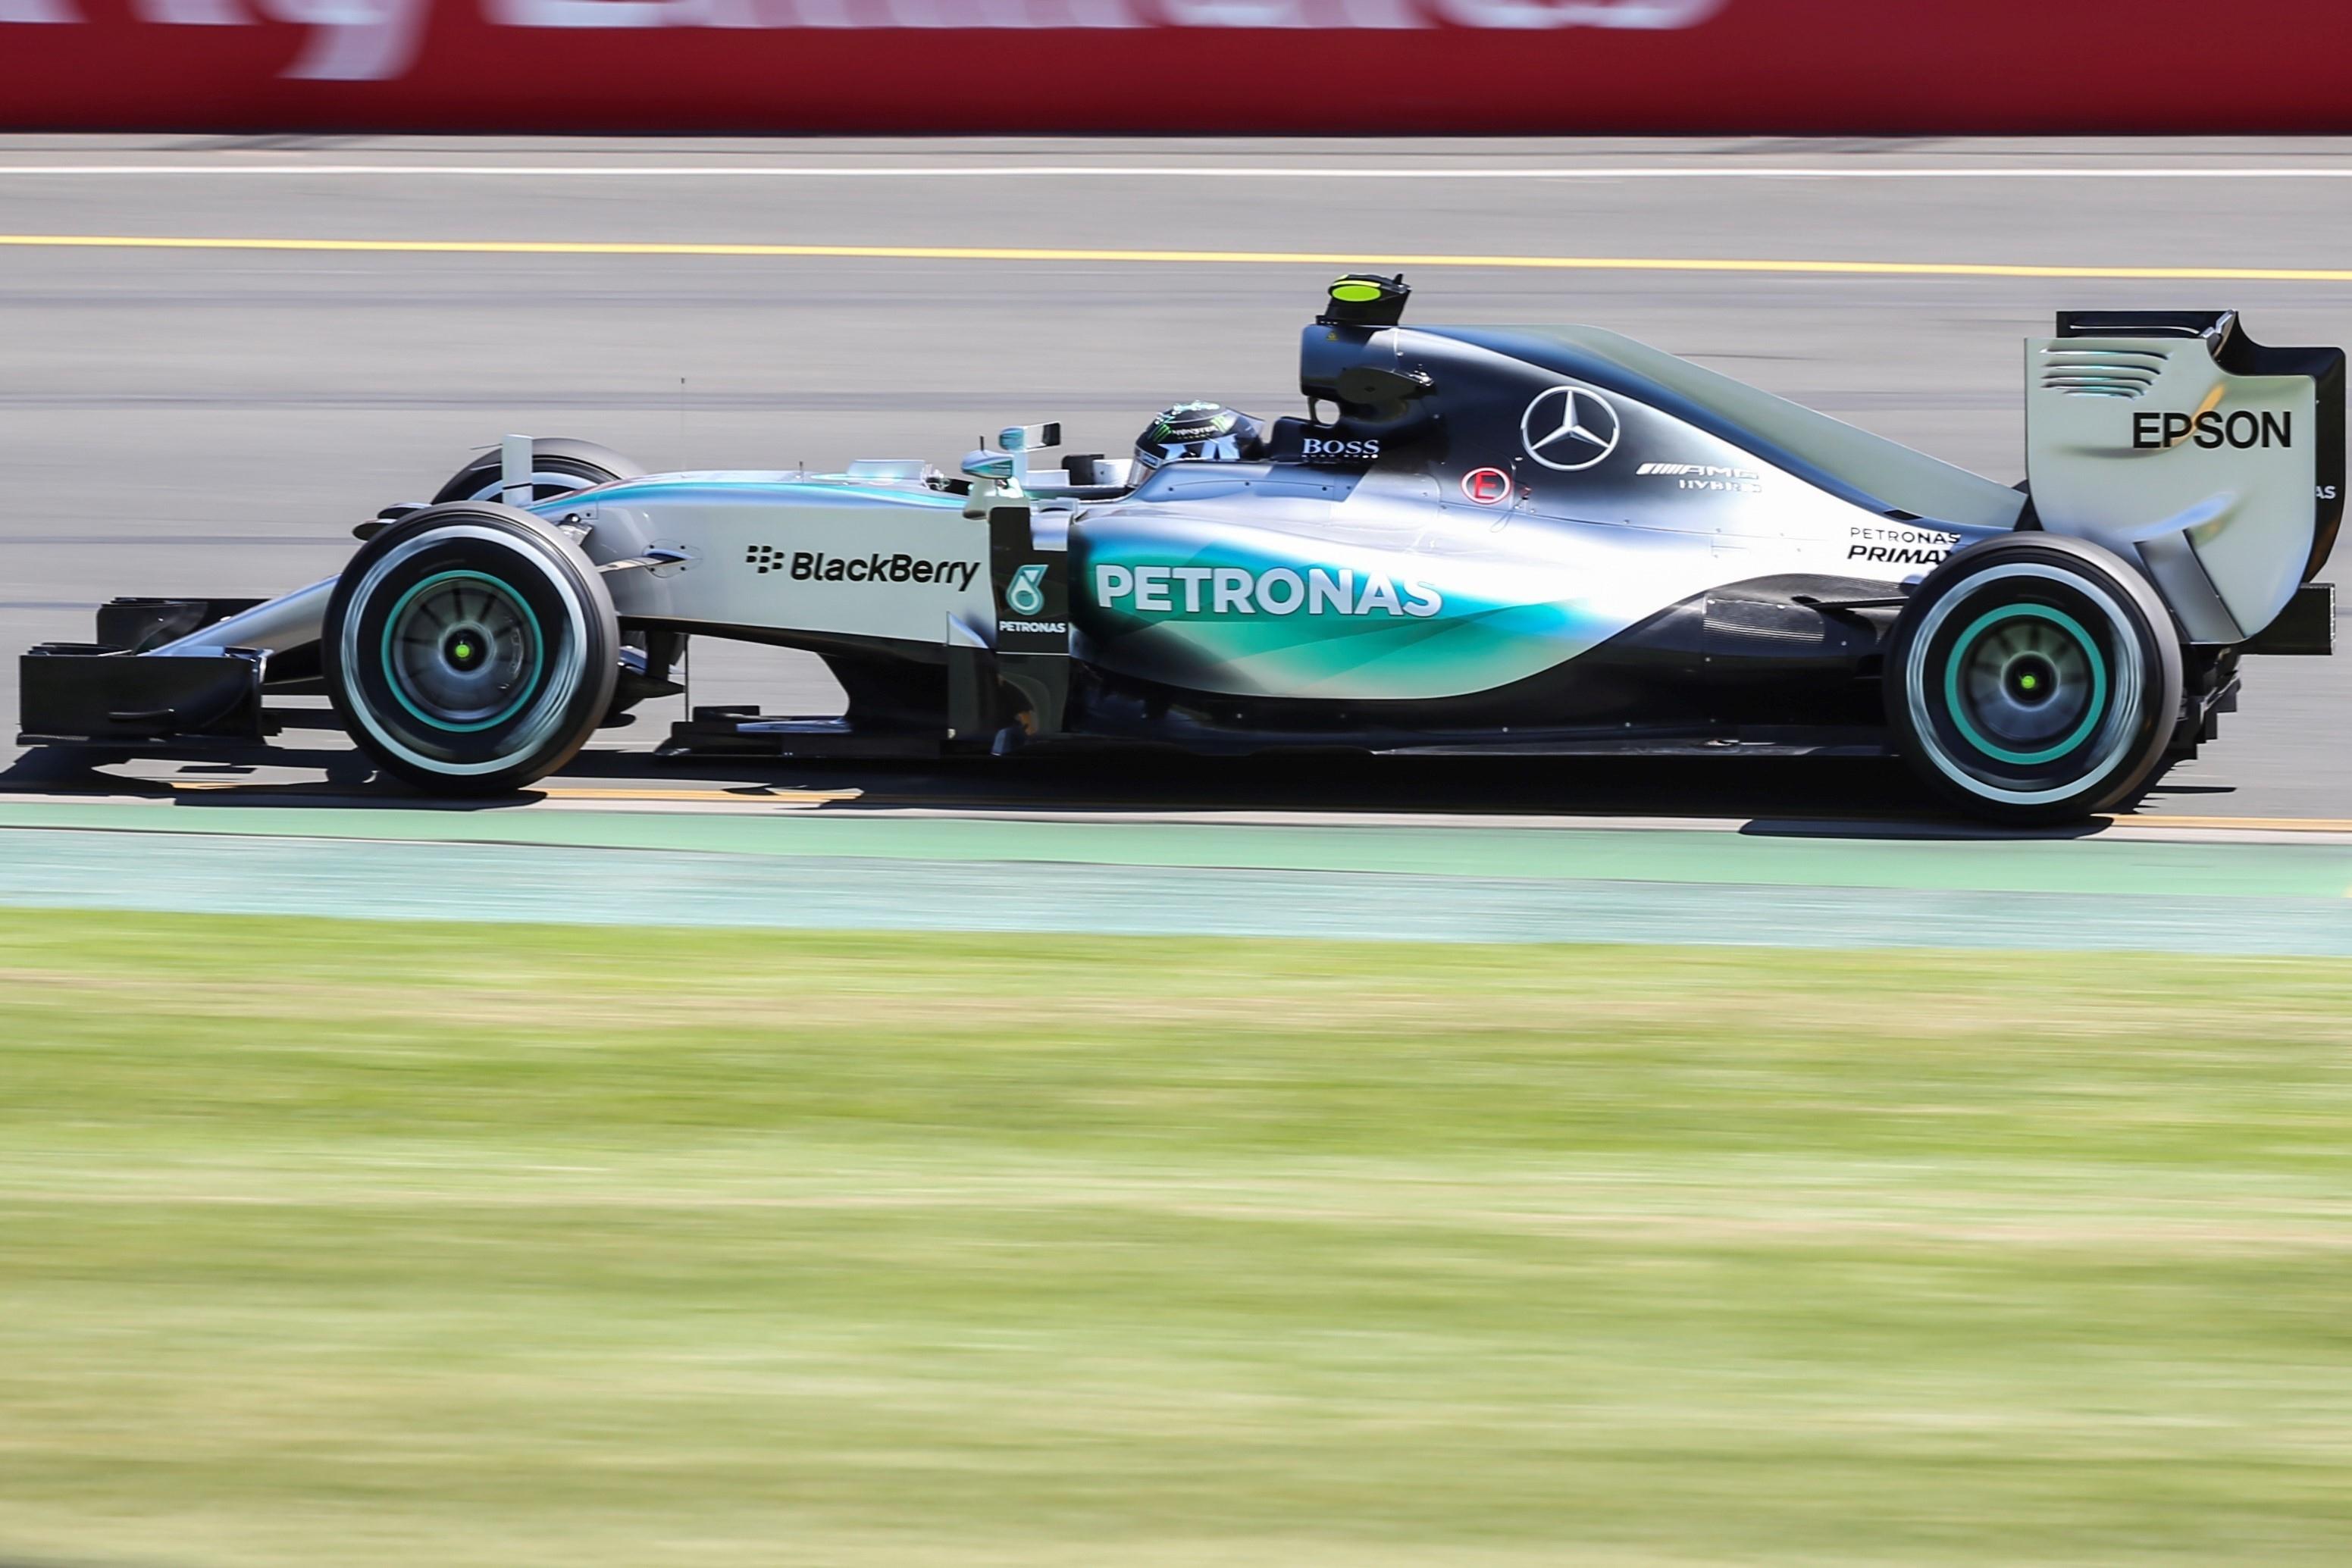 Australian Formula 1 Grand Prix - Friday Practice